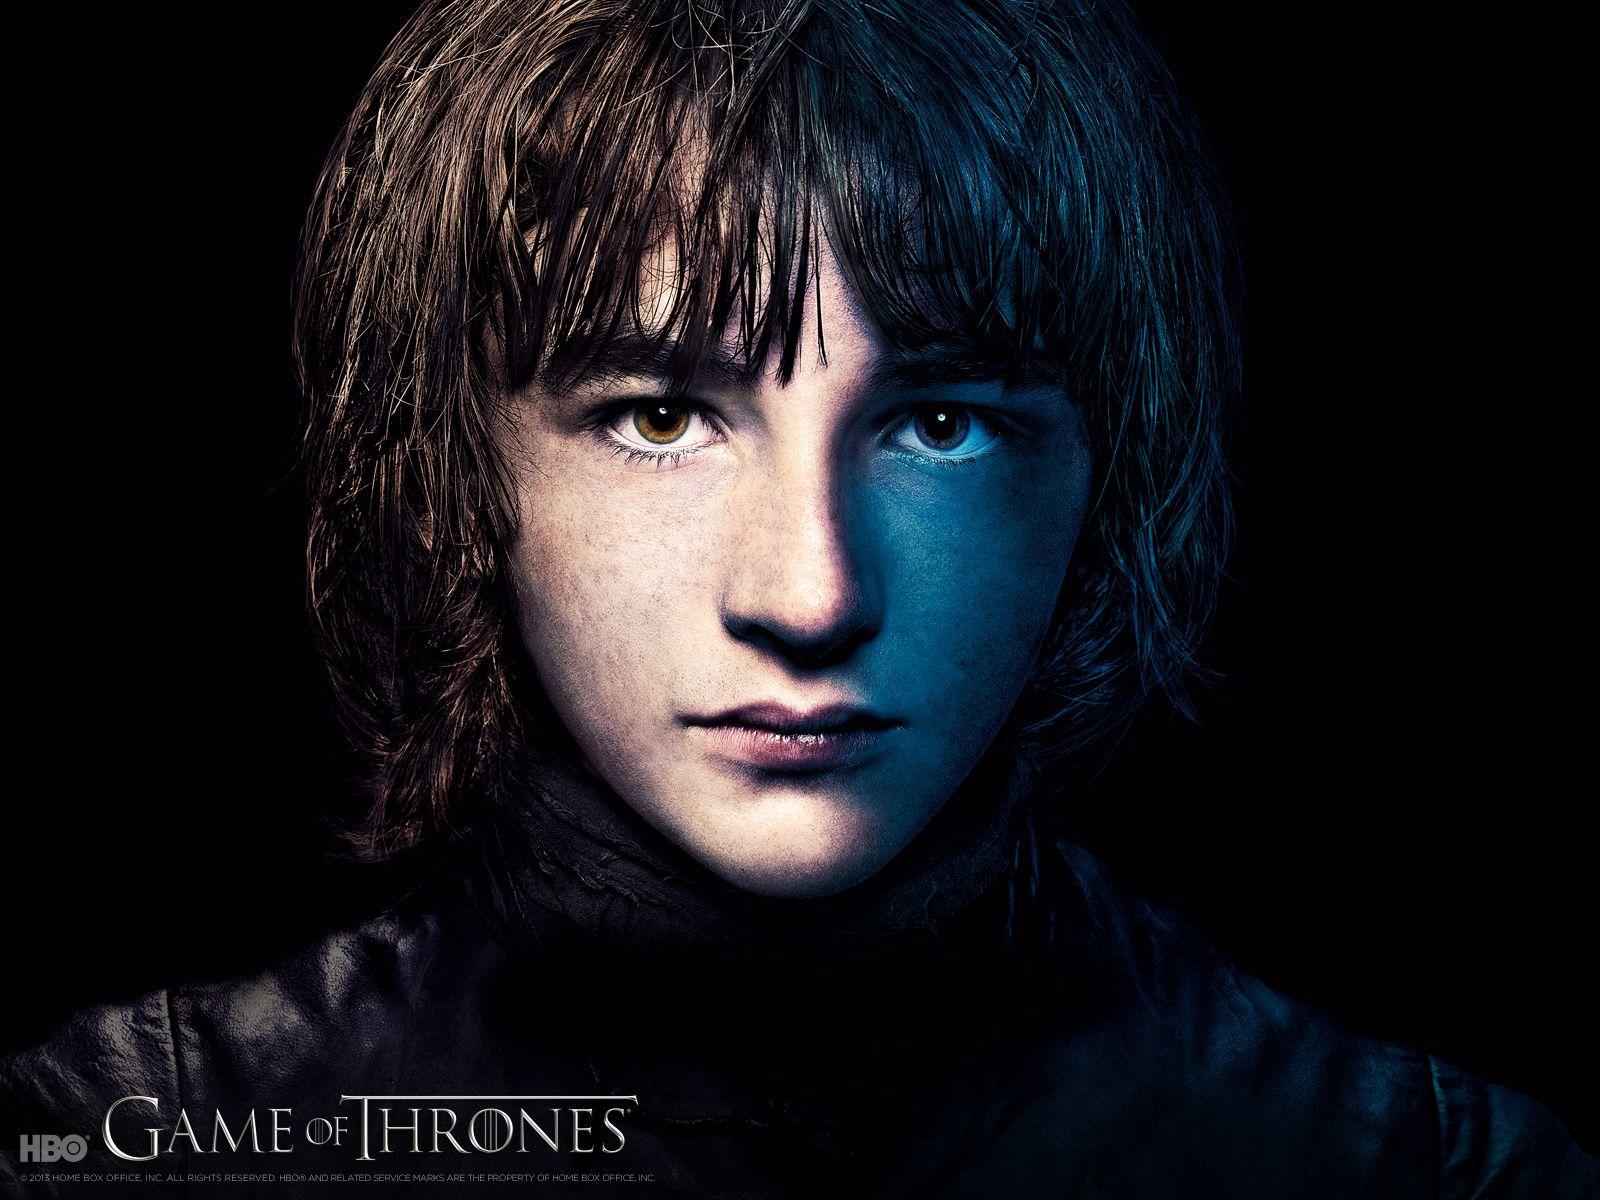 Isaac H. Wright as Bran Stark